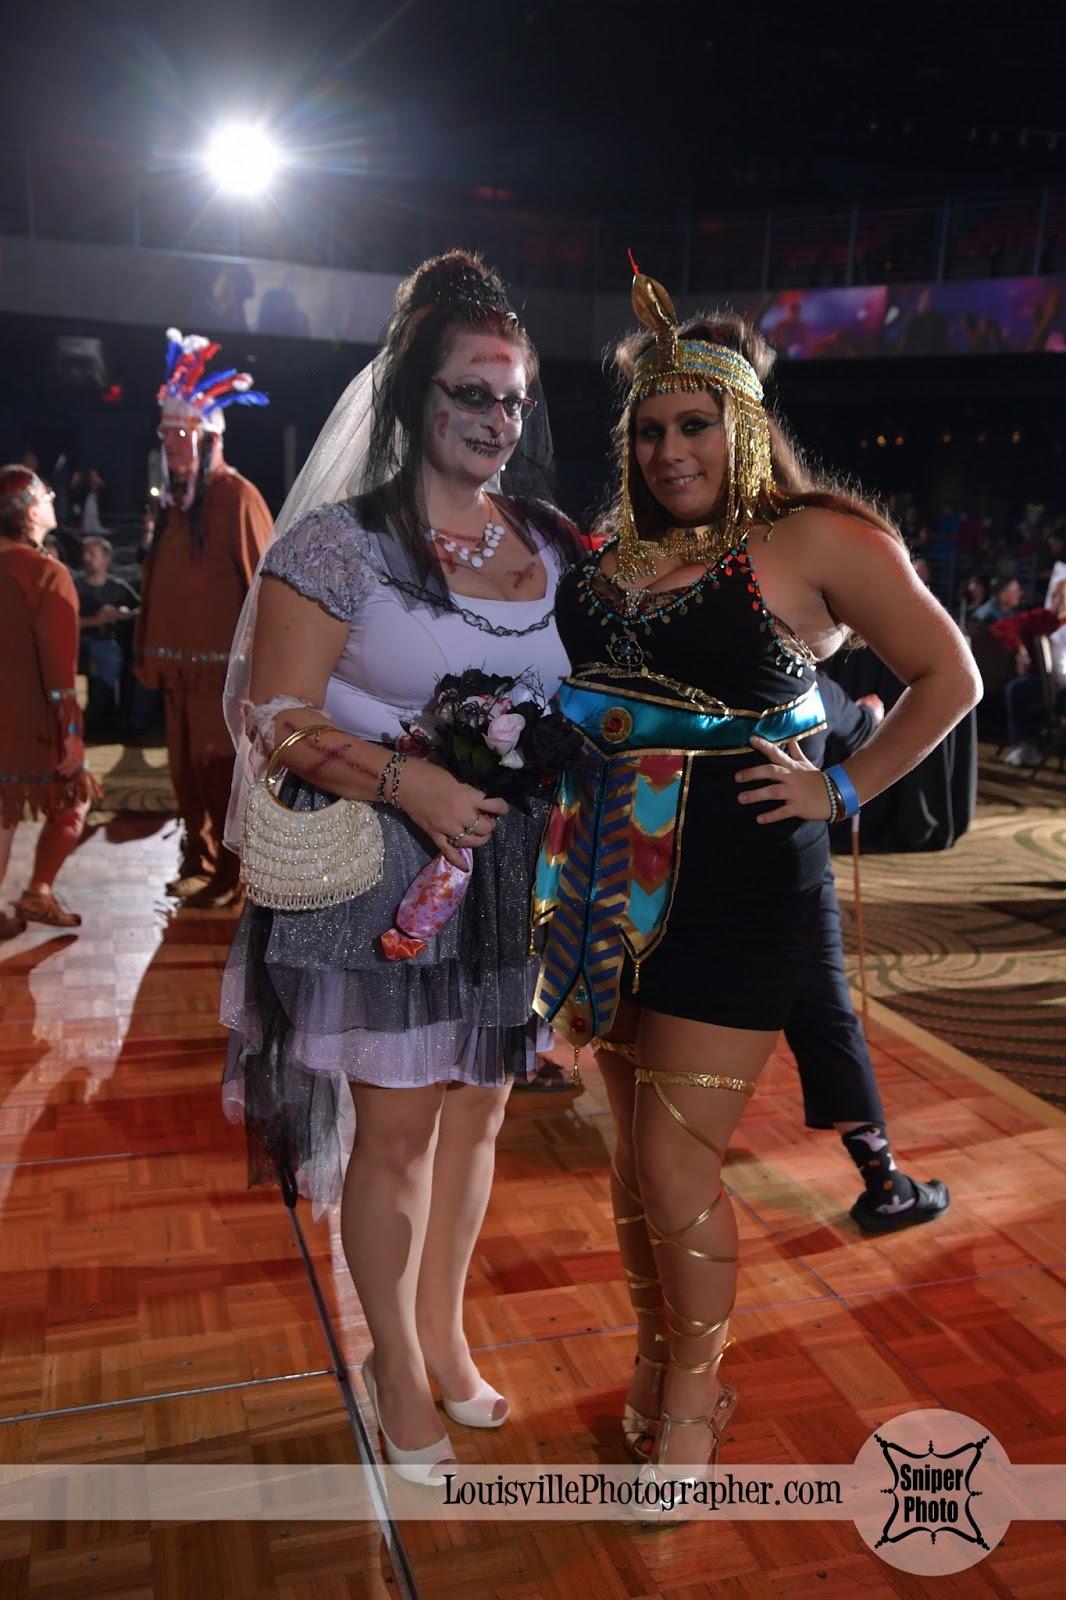 Louisville Event Photographer - Belterra Halloween Party | Sniper ...